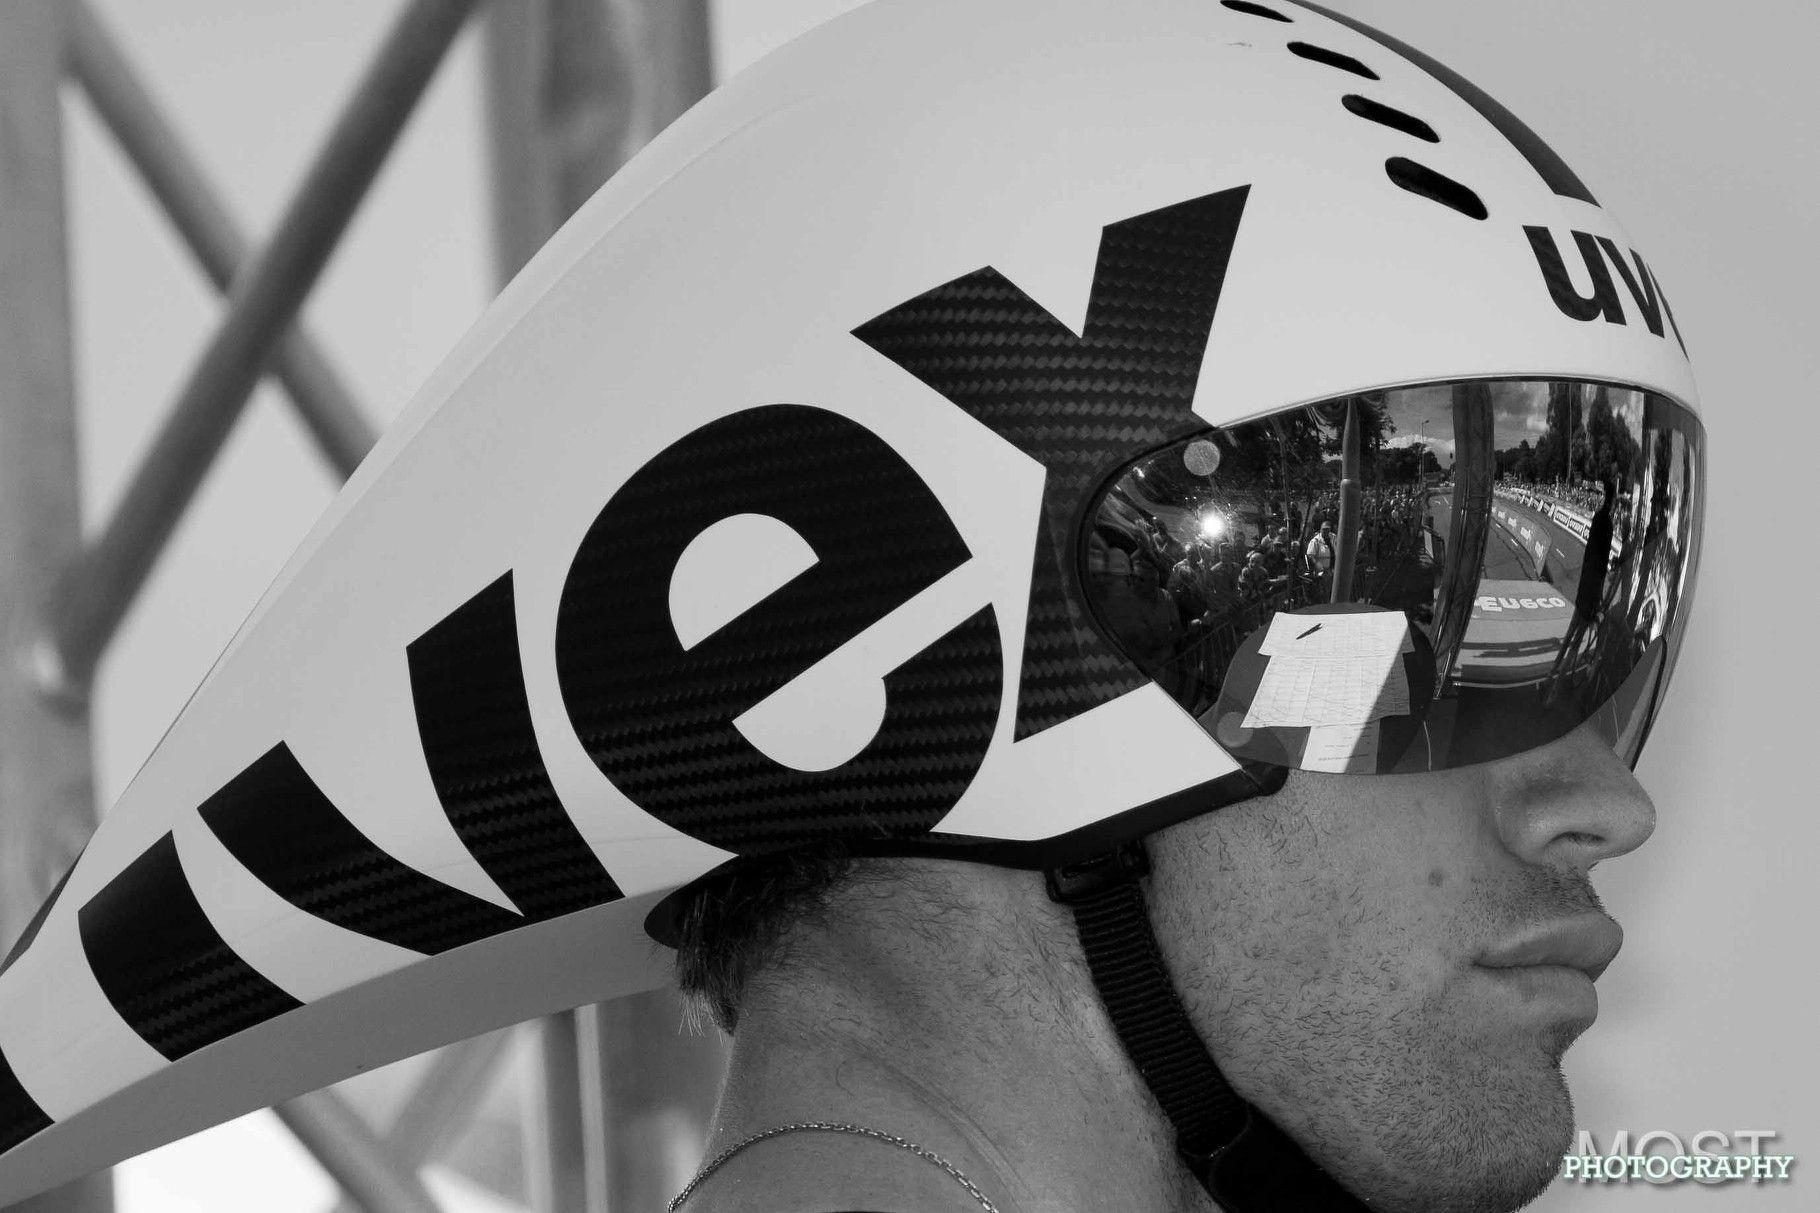 Eneco Tour 2014 - Team Giant-Shimano